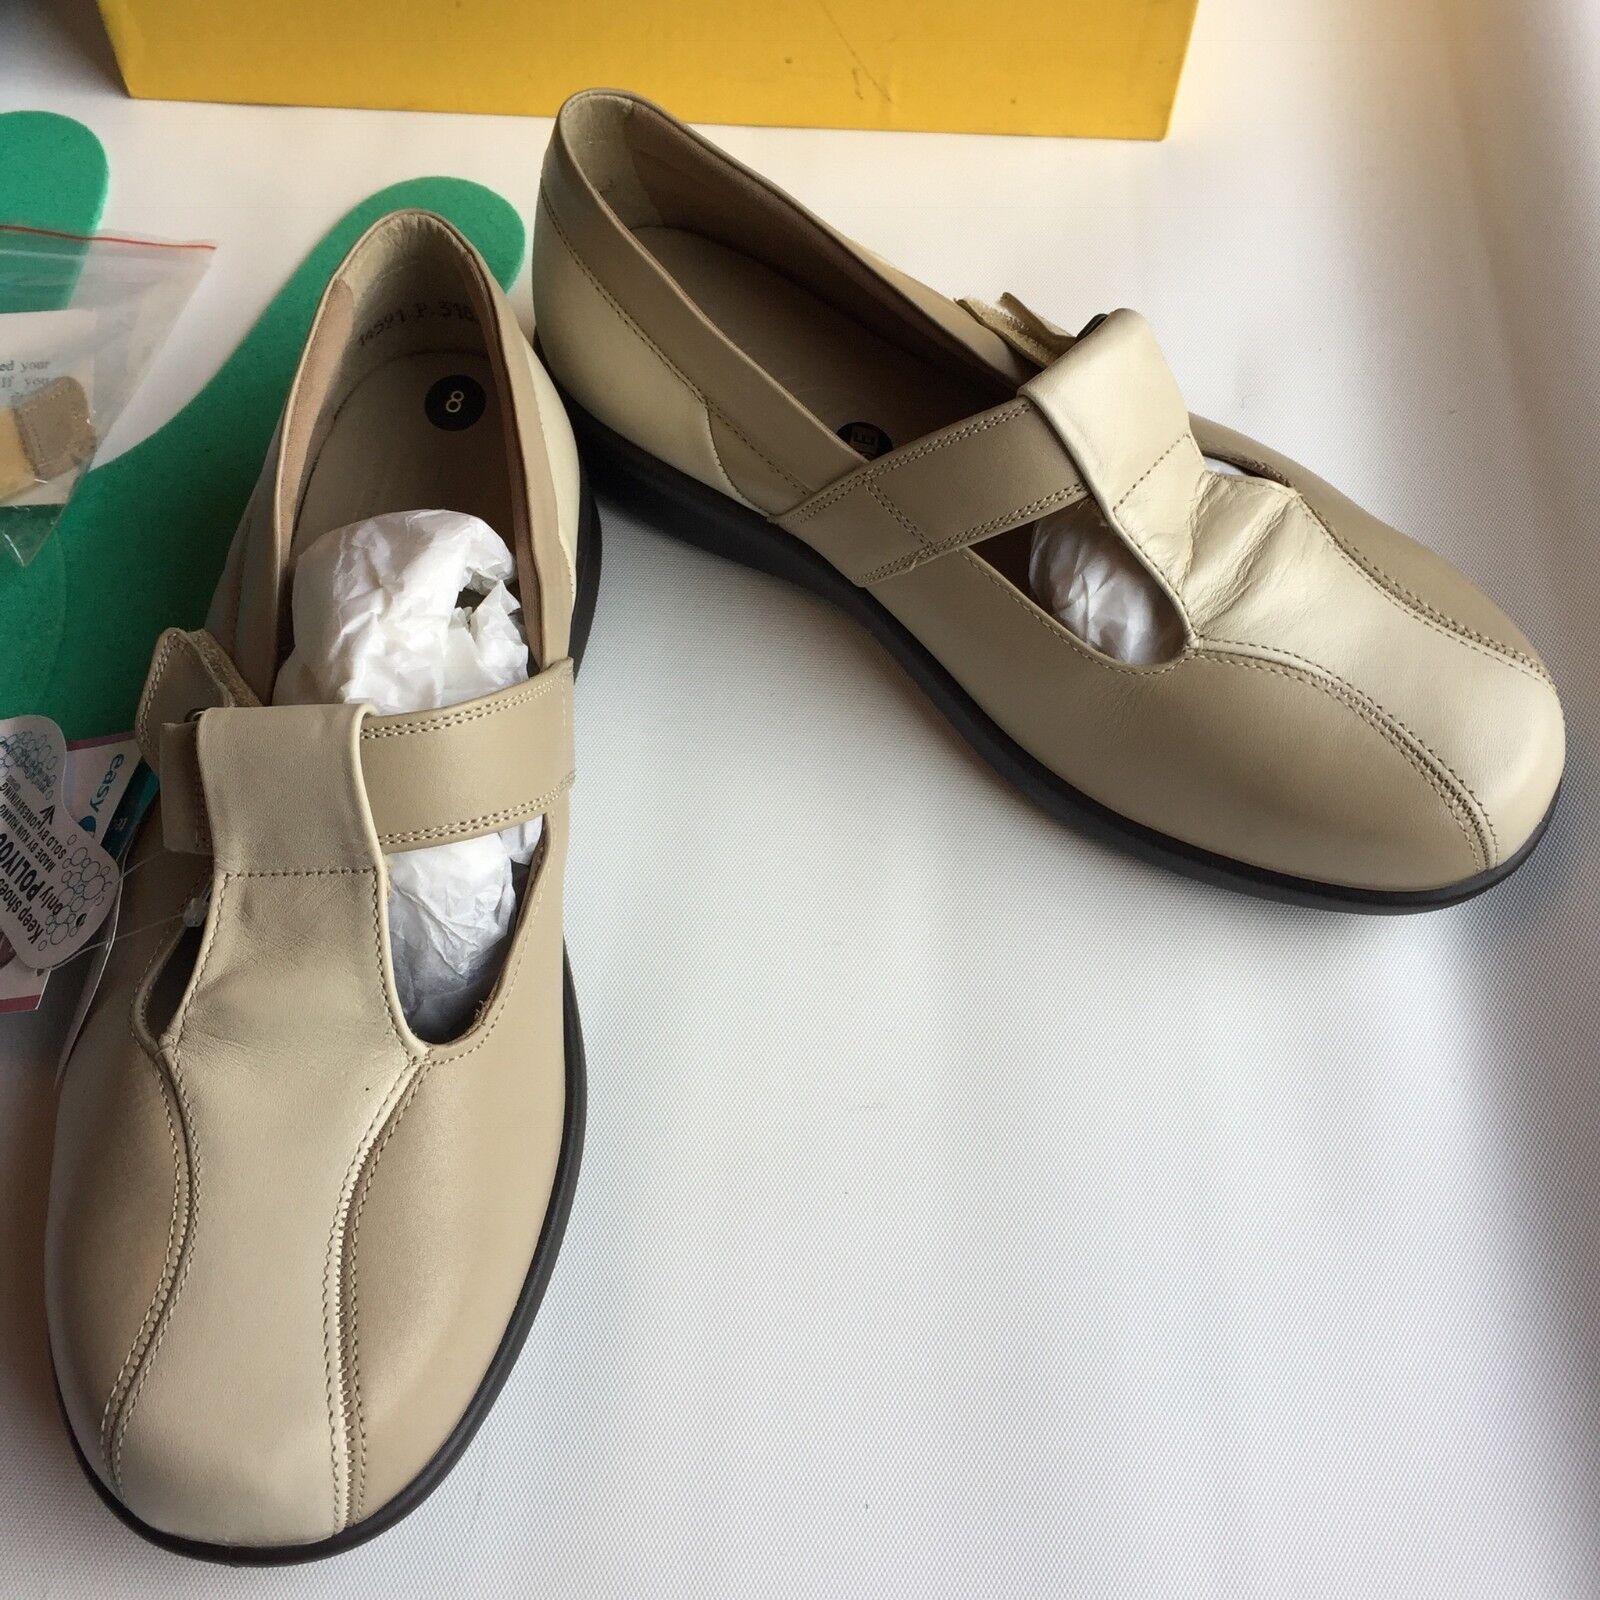 Damenschuhe Easy Schuhes B Leder Cream Beige Schuhes Easy w/Insoles, Bar Extensions Größe 8 Fit 6E 72f6bc